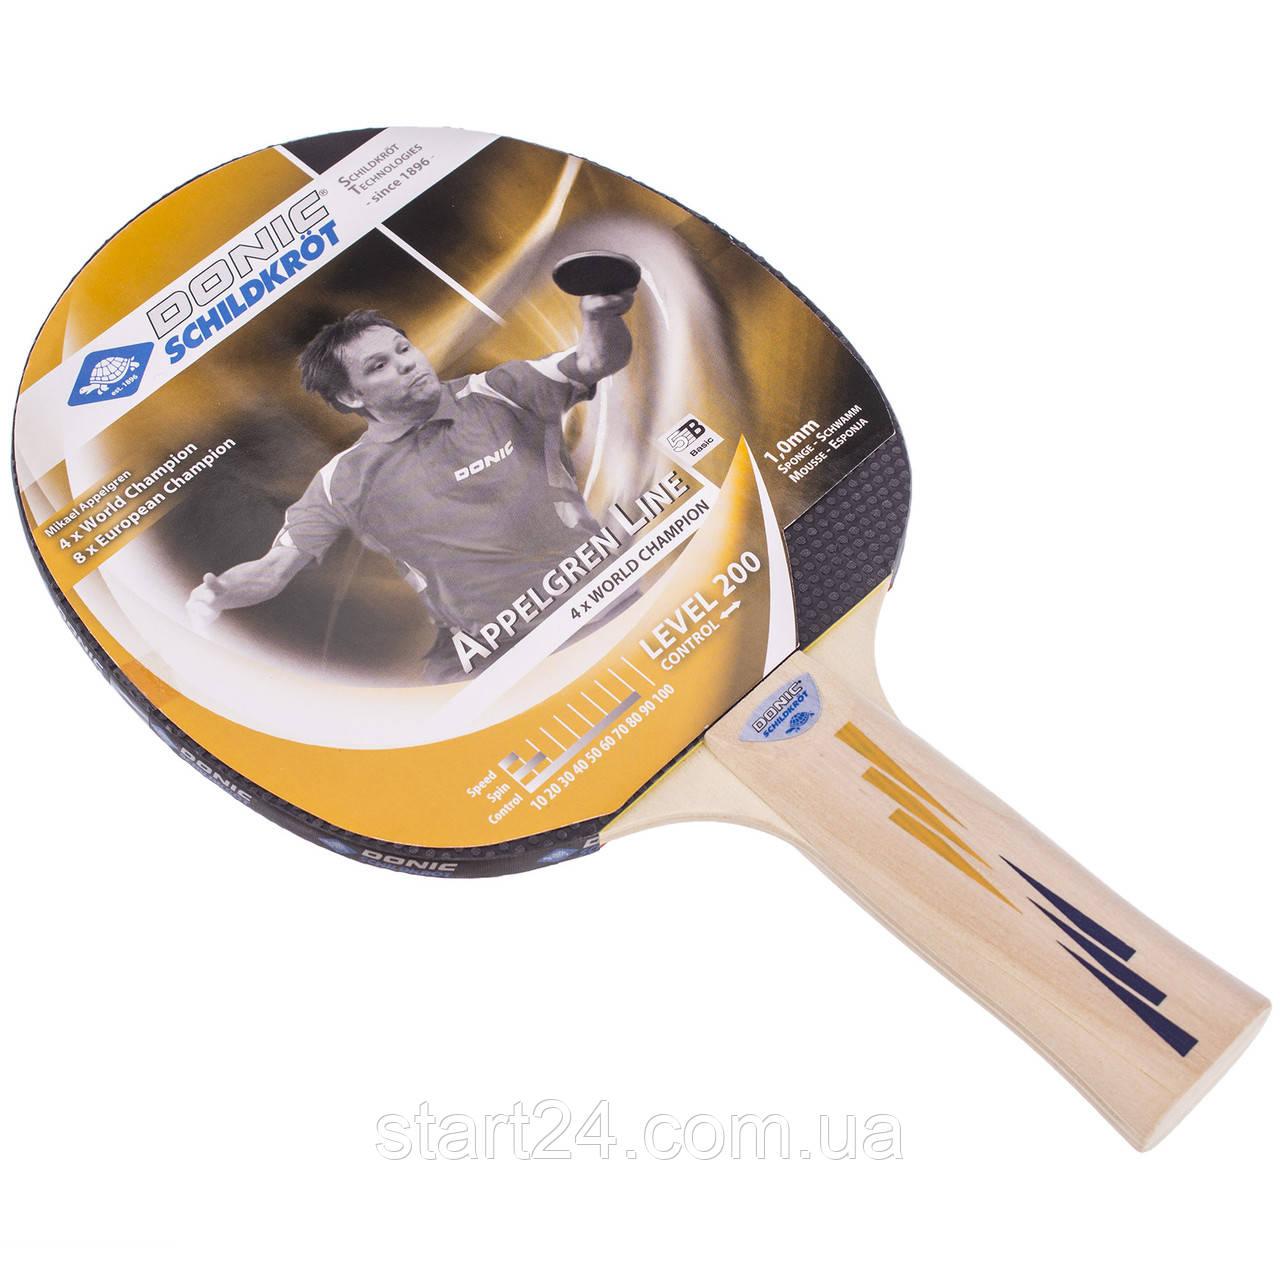 Ракетка для настільного тенісу 1 штука DONIC LEVEL 200 MT-703002 APPELGREN (деревина, гума)